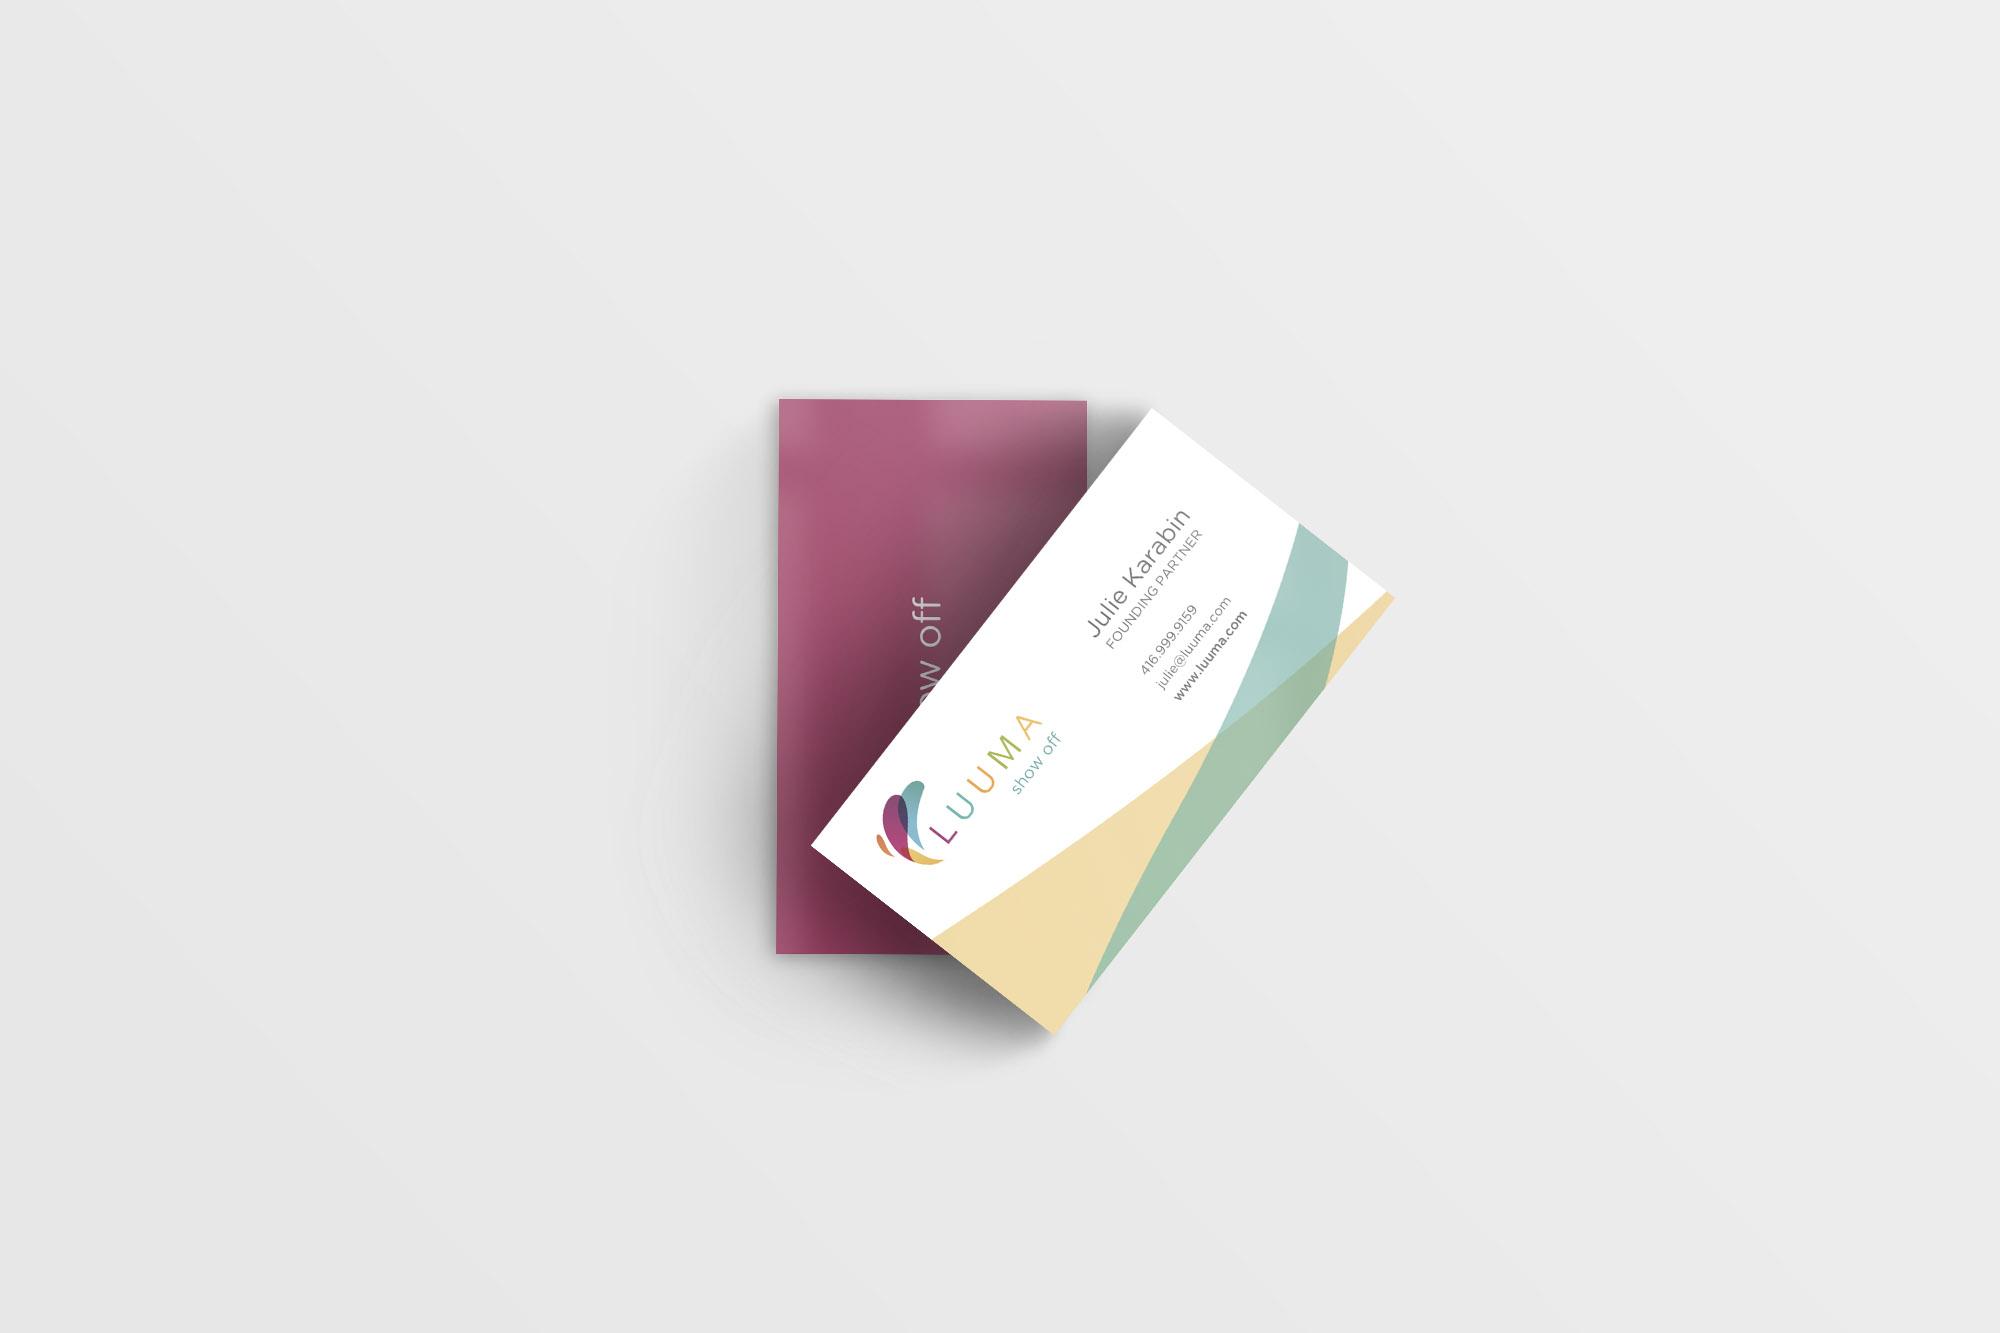 luuma_Business Card Mockup 18 (Free Version).jpg